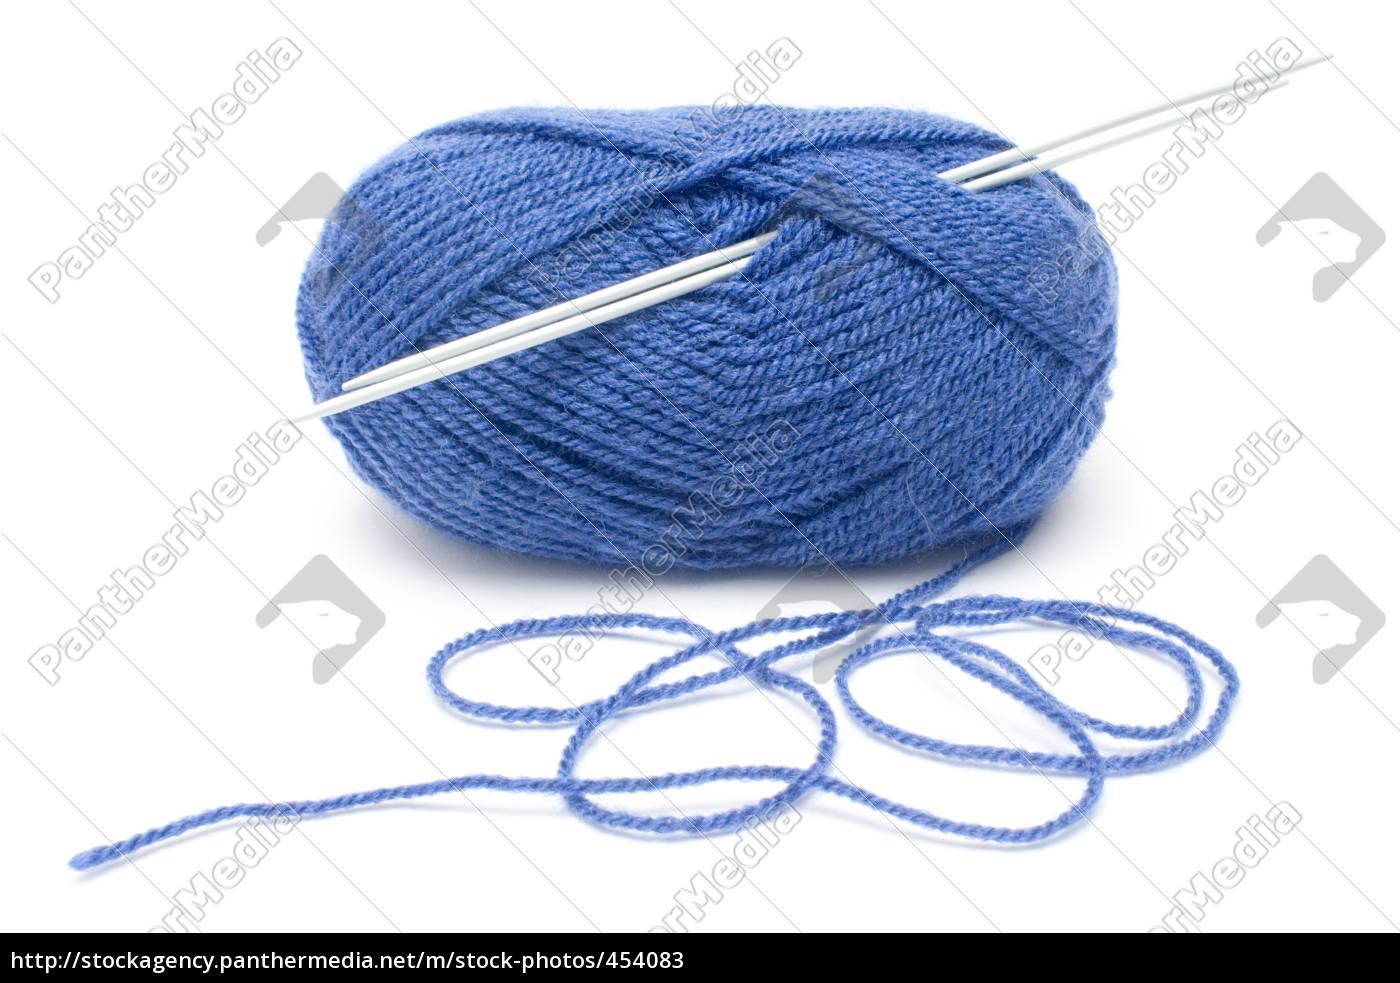 knit - 454083